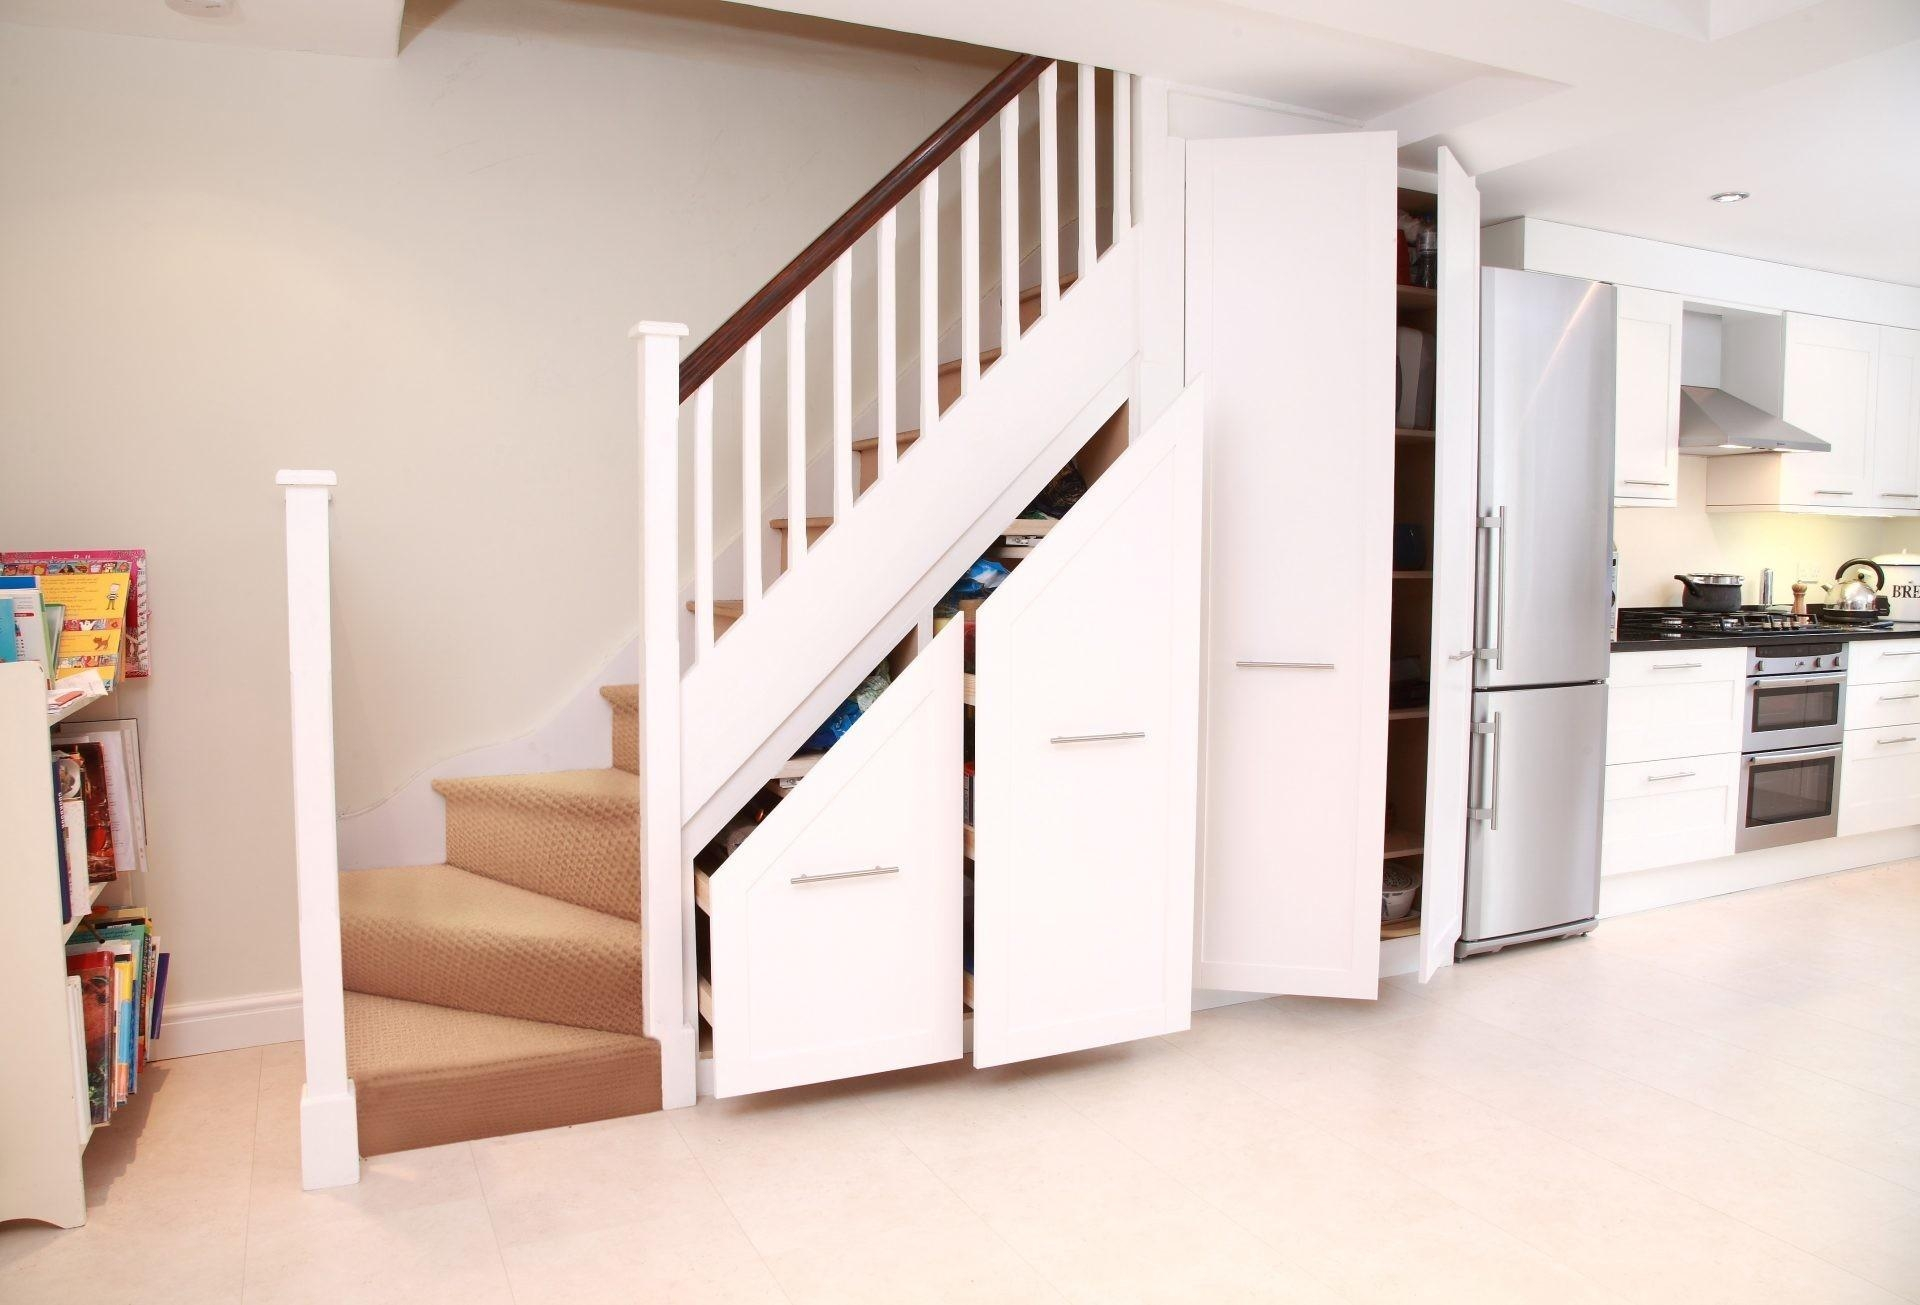 32 Dream Under Stair Storage That You Should See Today Inspire   Modern Under Stairs Storage   Storage Underneath   Bed   External   Concealed   Loft